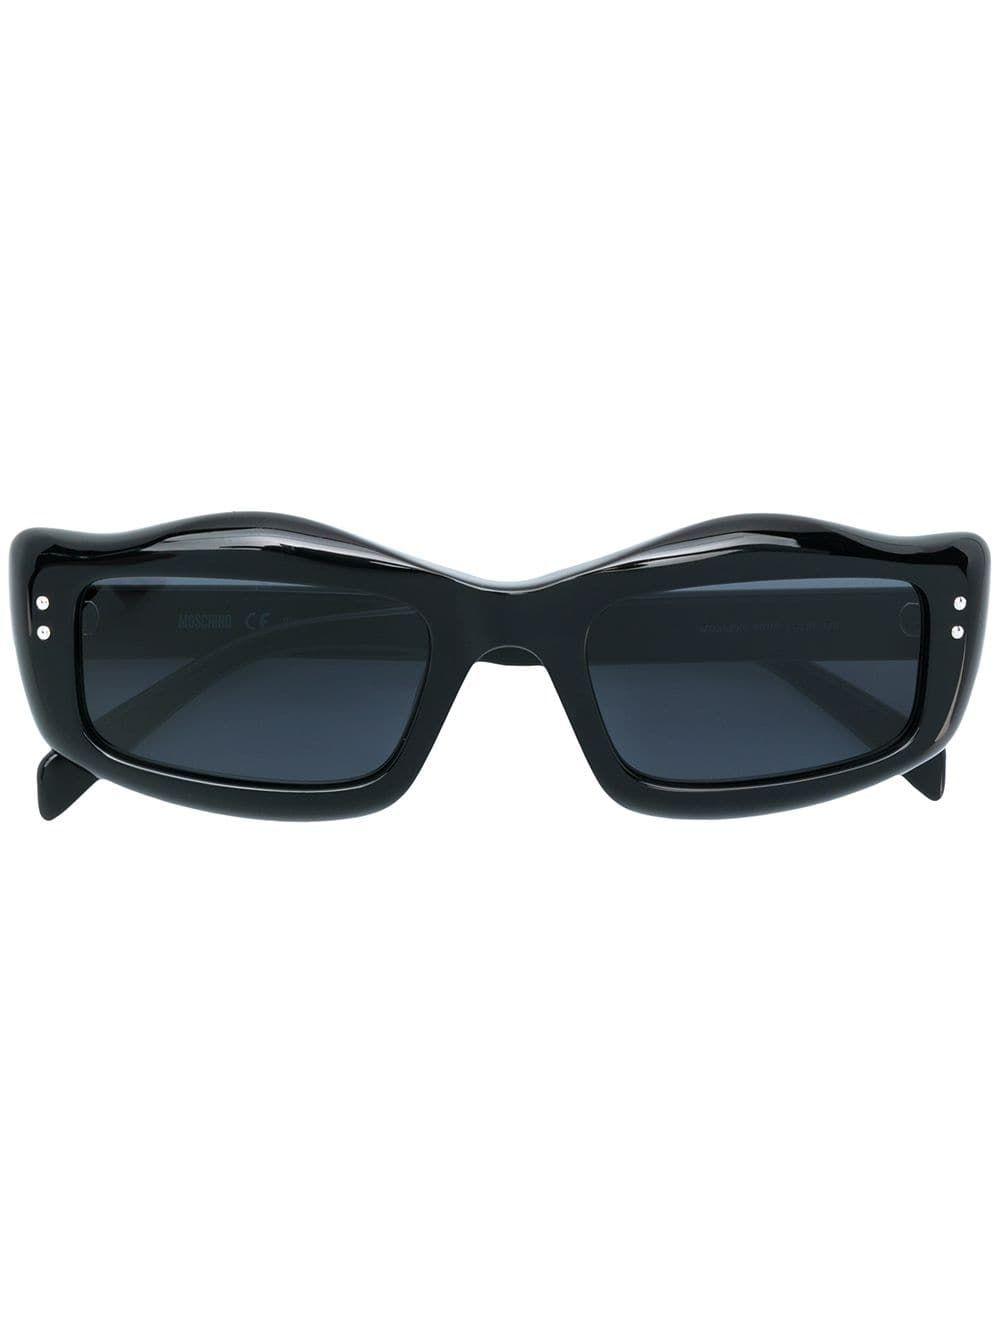 Moschino Mos029/s sunglasses